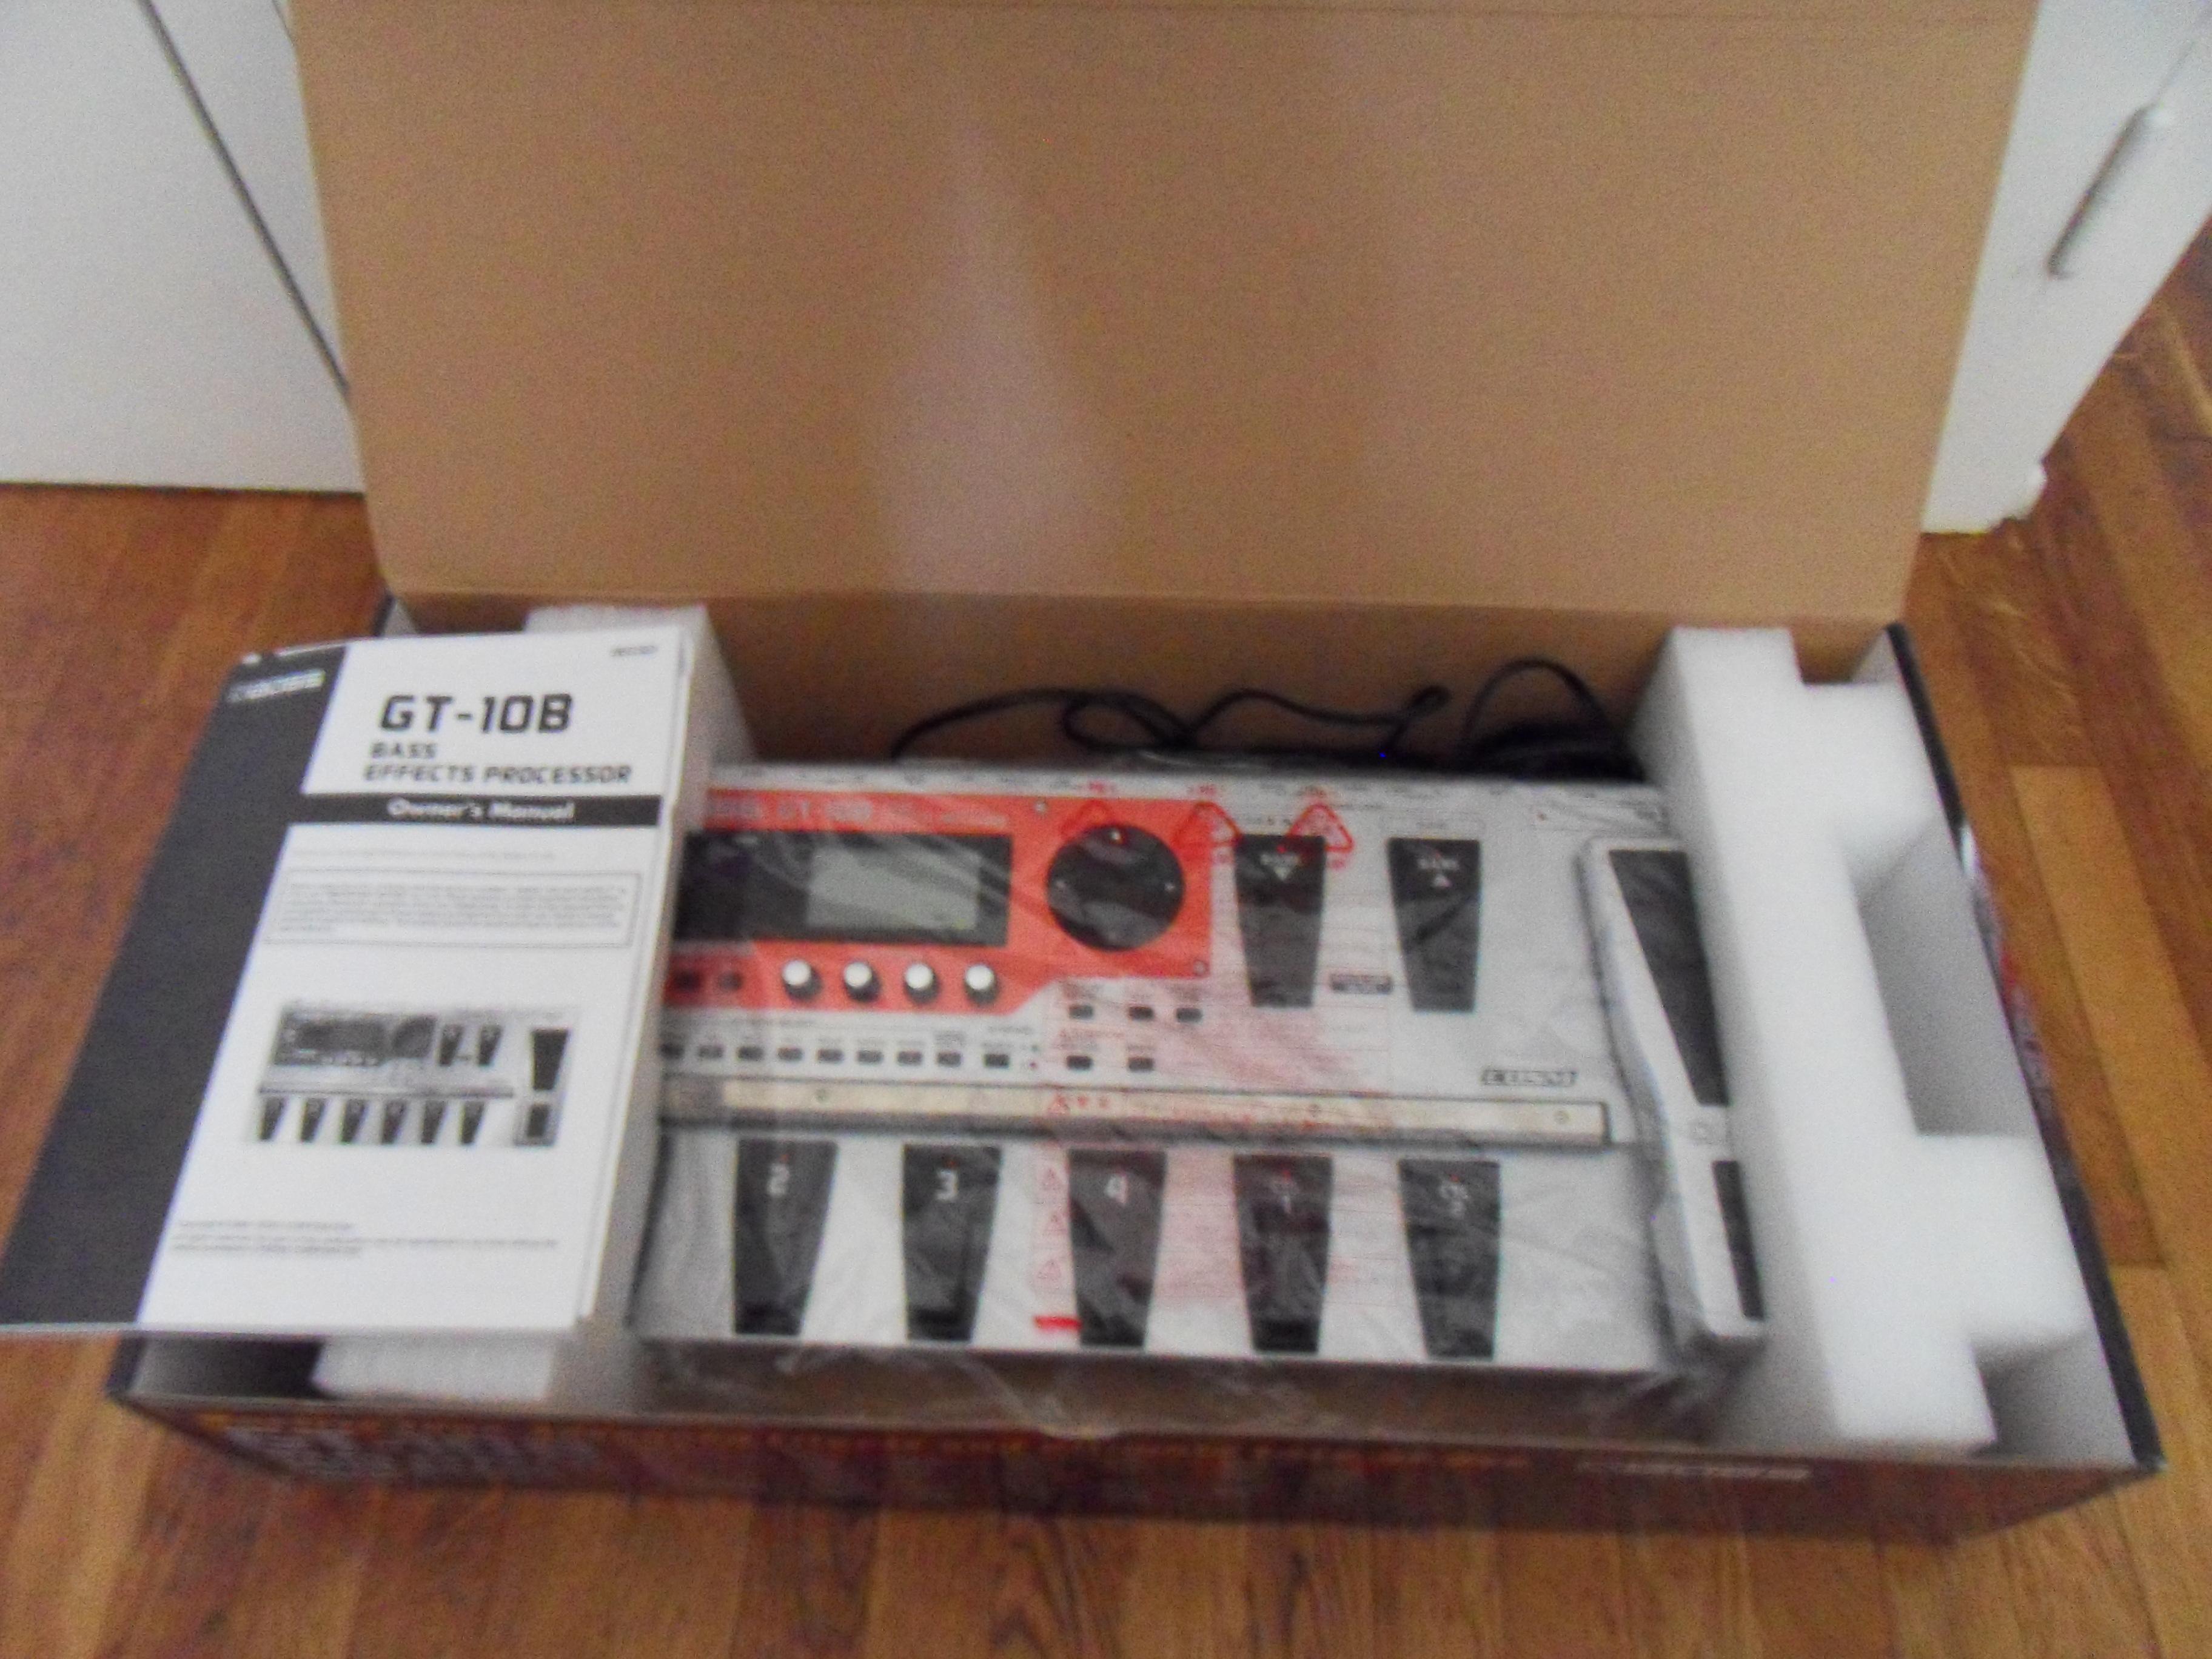 boss gt 10b image 599479 audiofanzine rh en audiofanzine com gt-10b bass effects processor manual gt-10b manual